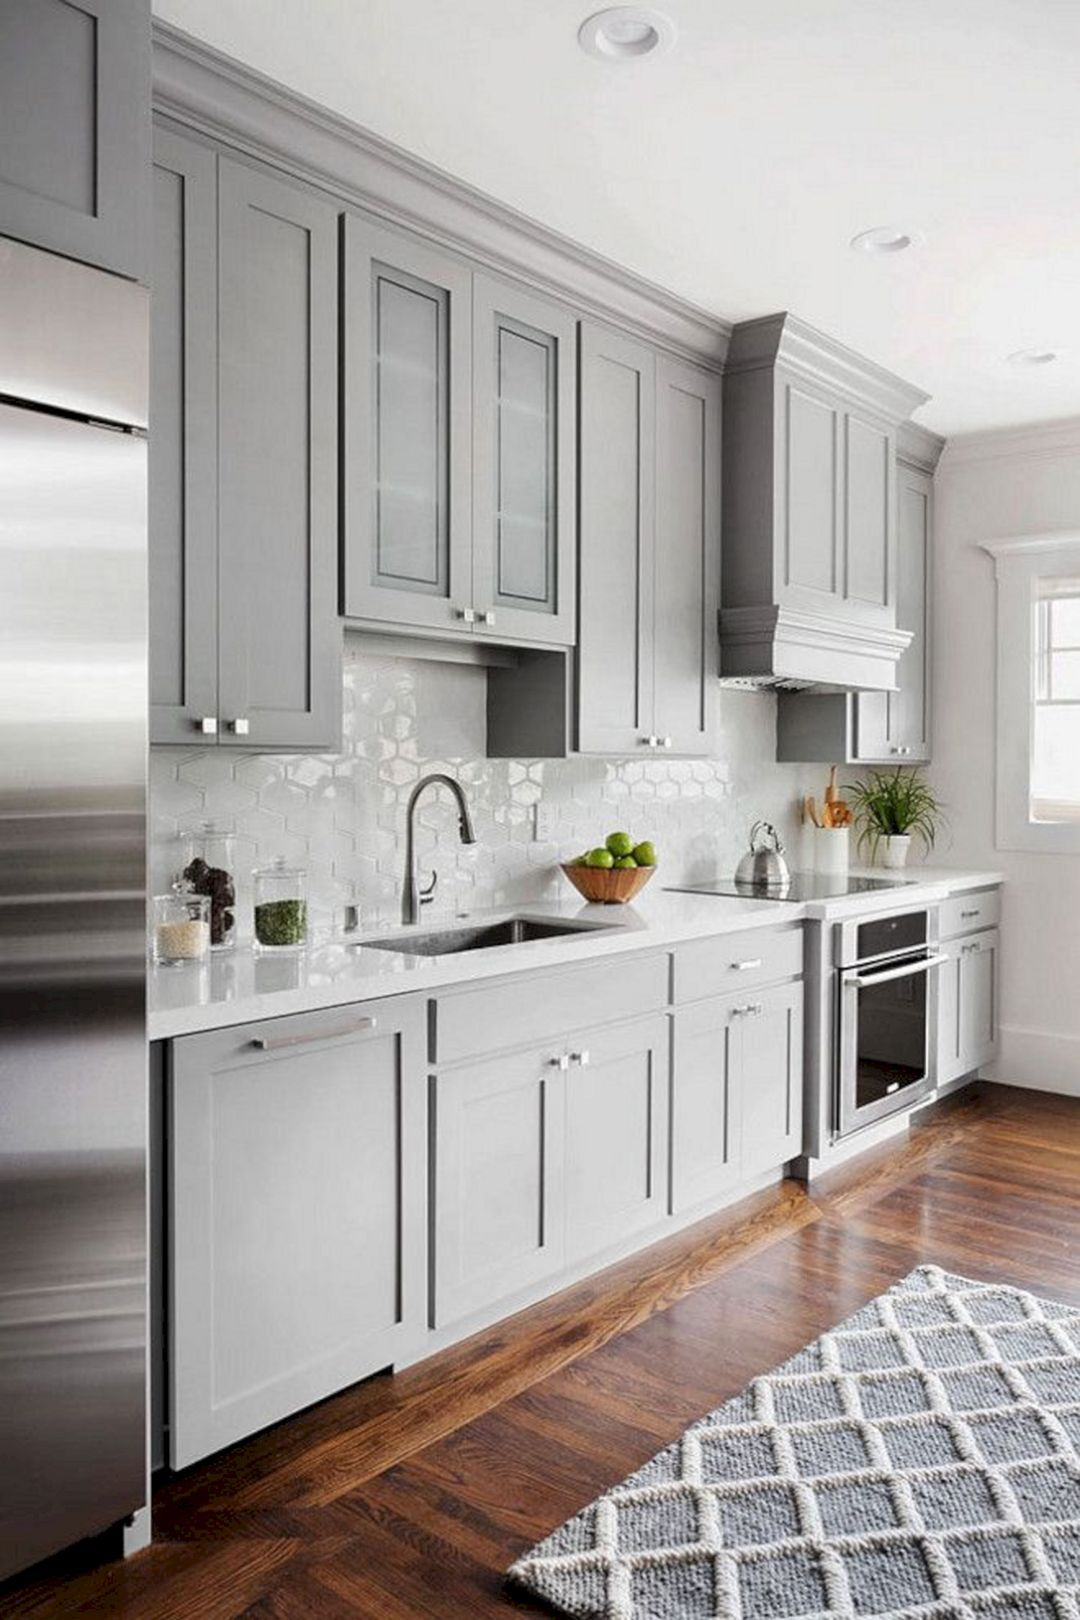 Top Best Kitchen Decor Collection Ideas Modern Farmhouse Rustic